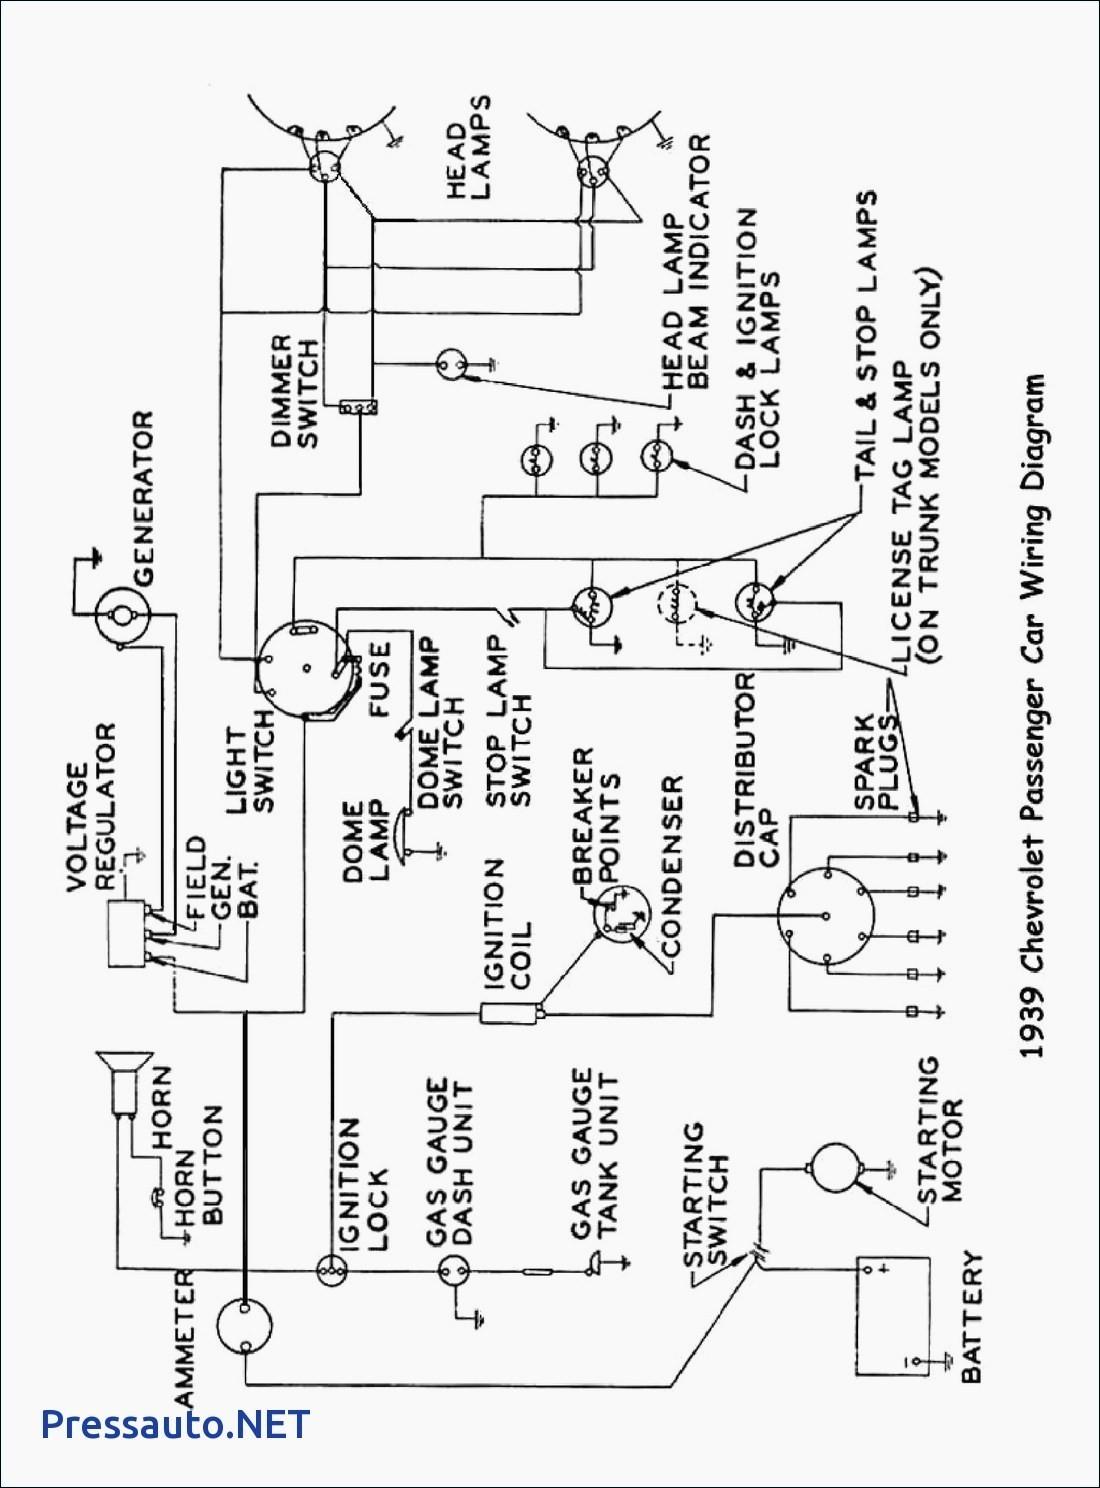 hight resolution of john deere 4440 light wiring diagram wiring diagrams optionswiring schematic for 4440 john deere wiring diagram